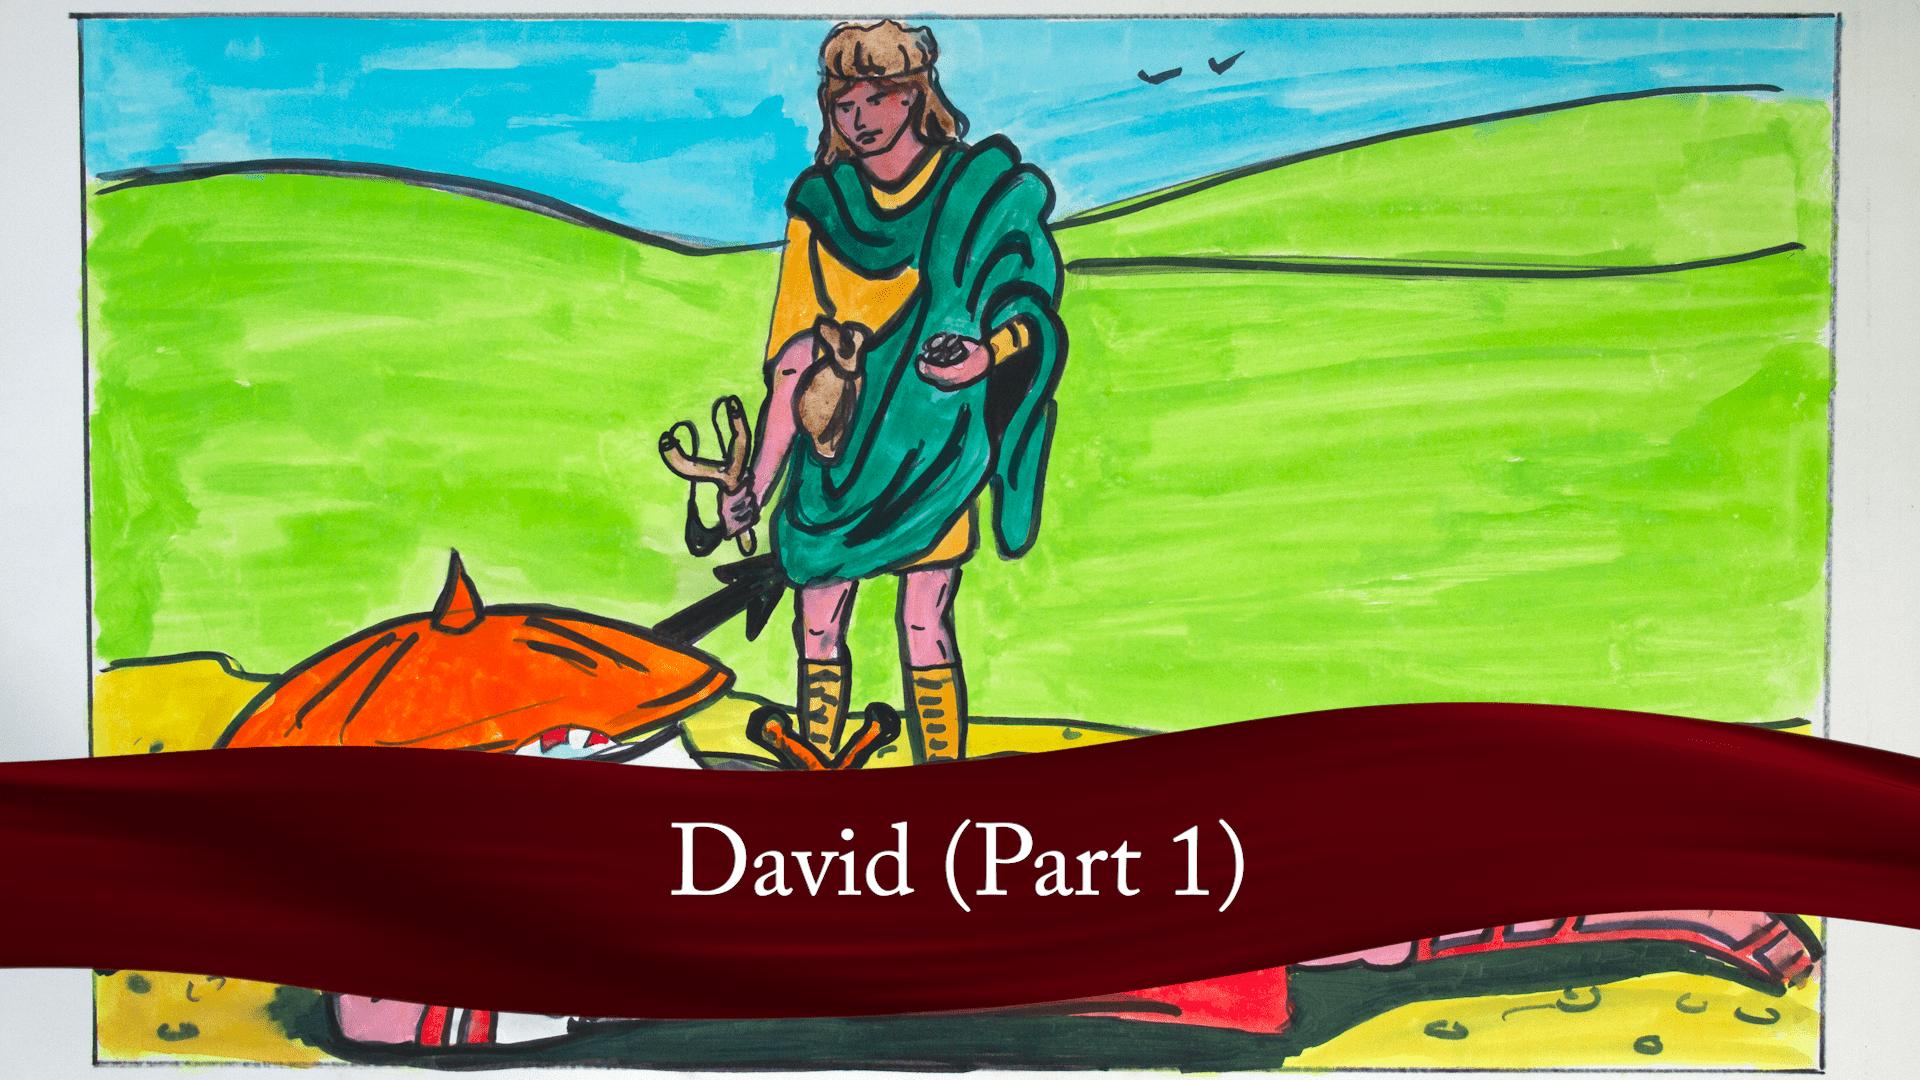 David (Part 1)